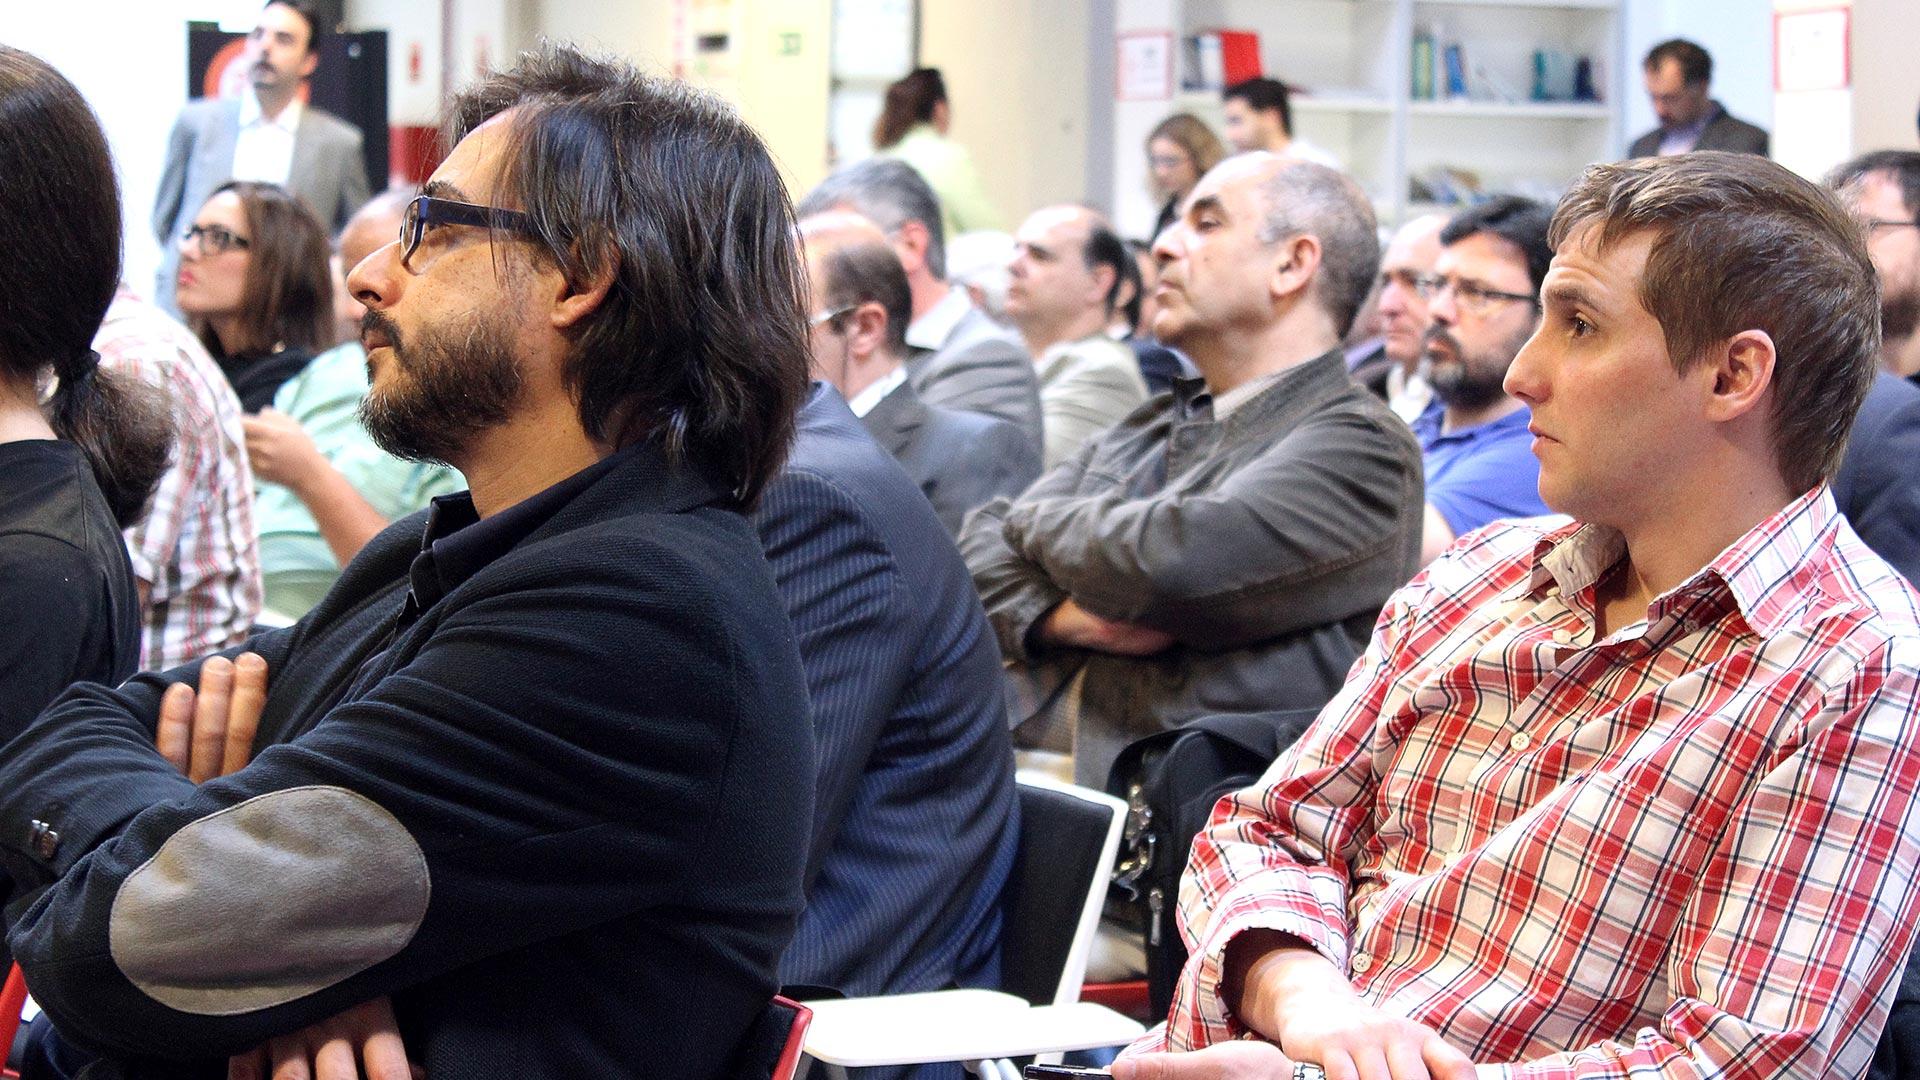 tpnet-eventos-encuentros-profesionales-iot-publico-5